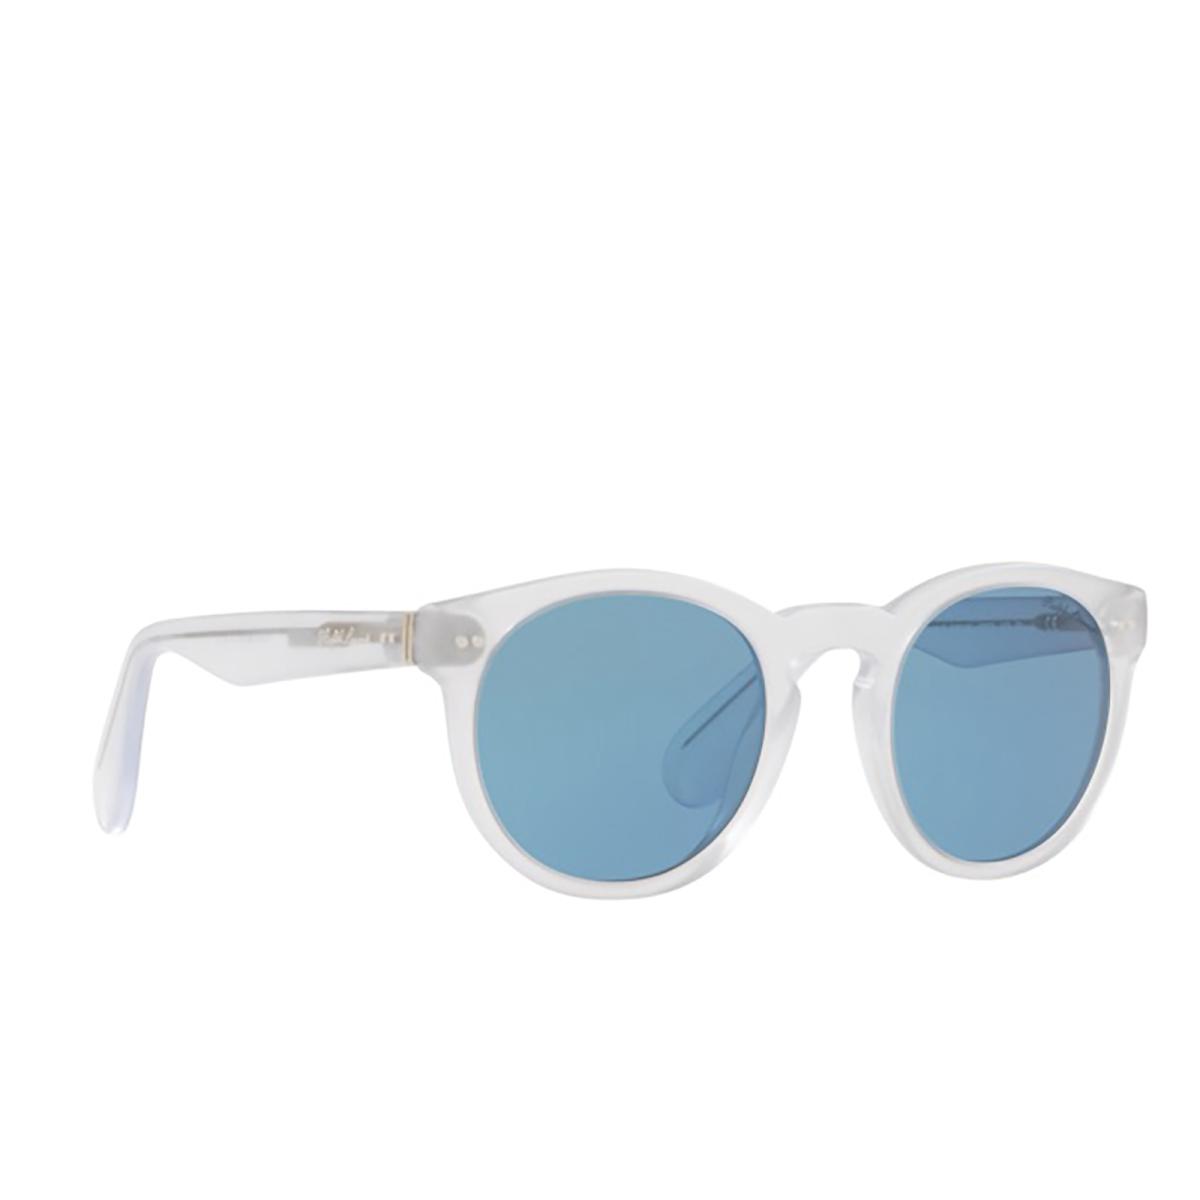 Ralph Lauren® Round Sunglasses: RL8146P color Sandbalst Crystal 500256 - three-quarters view.